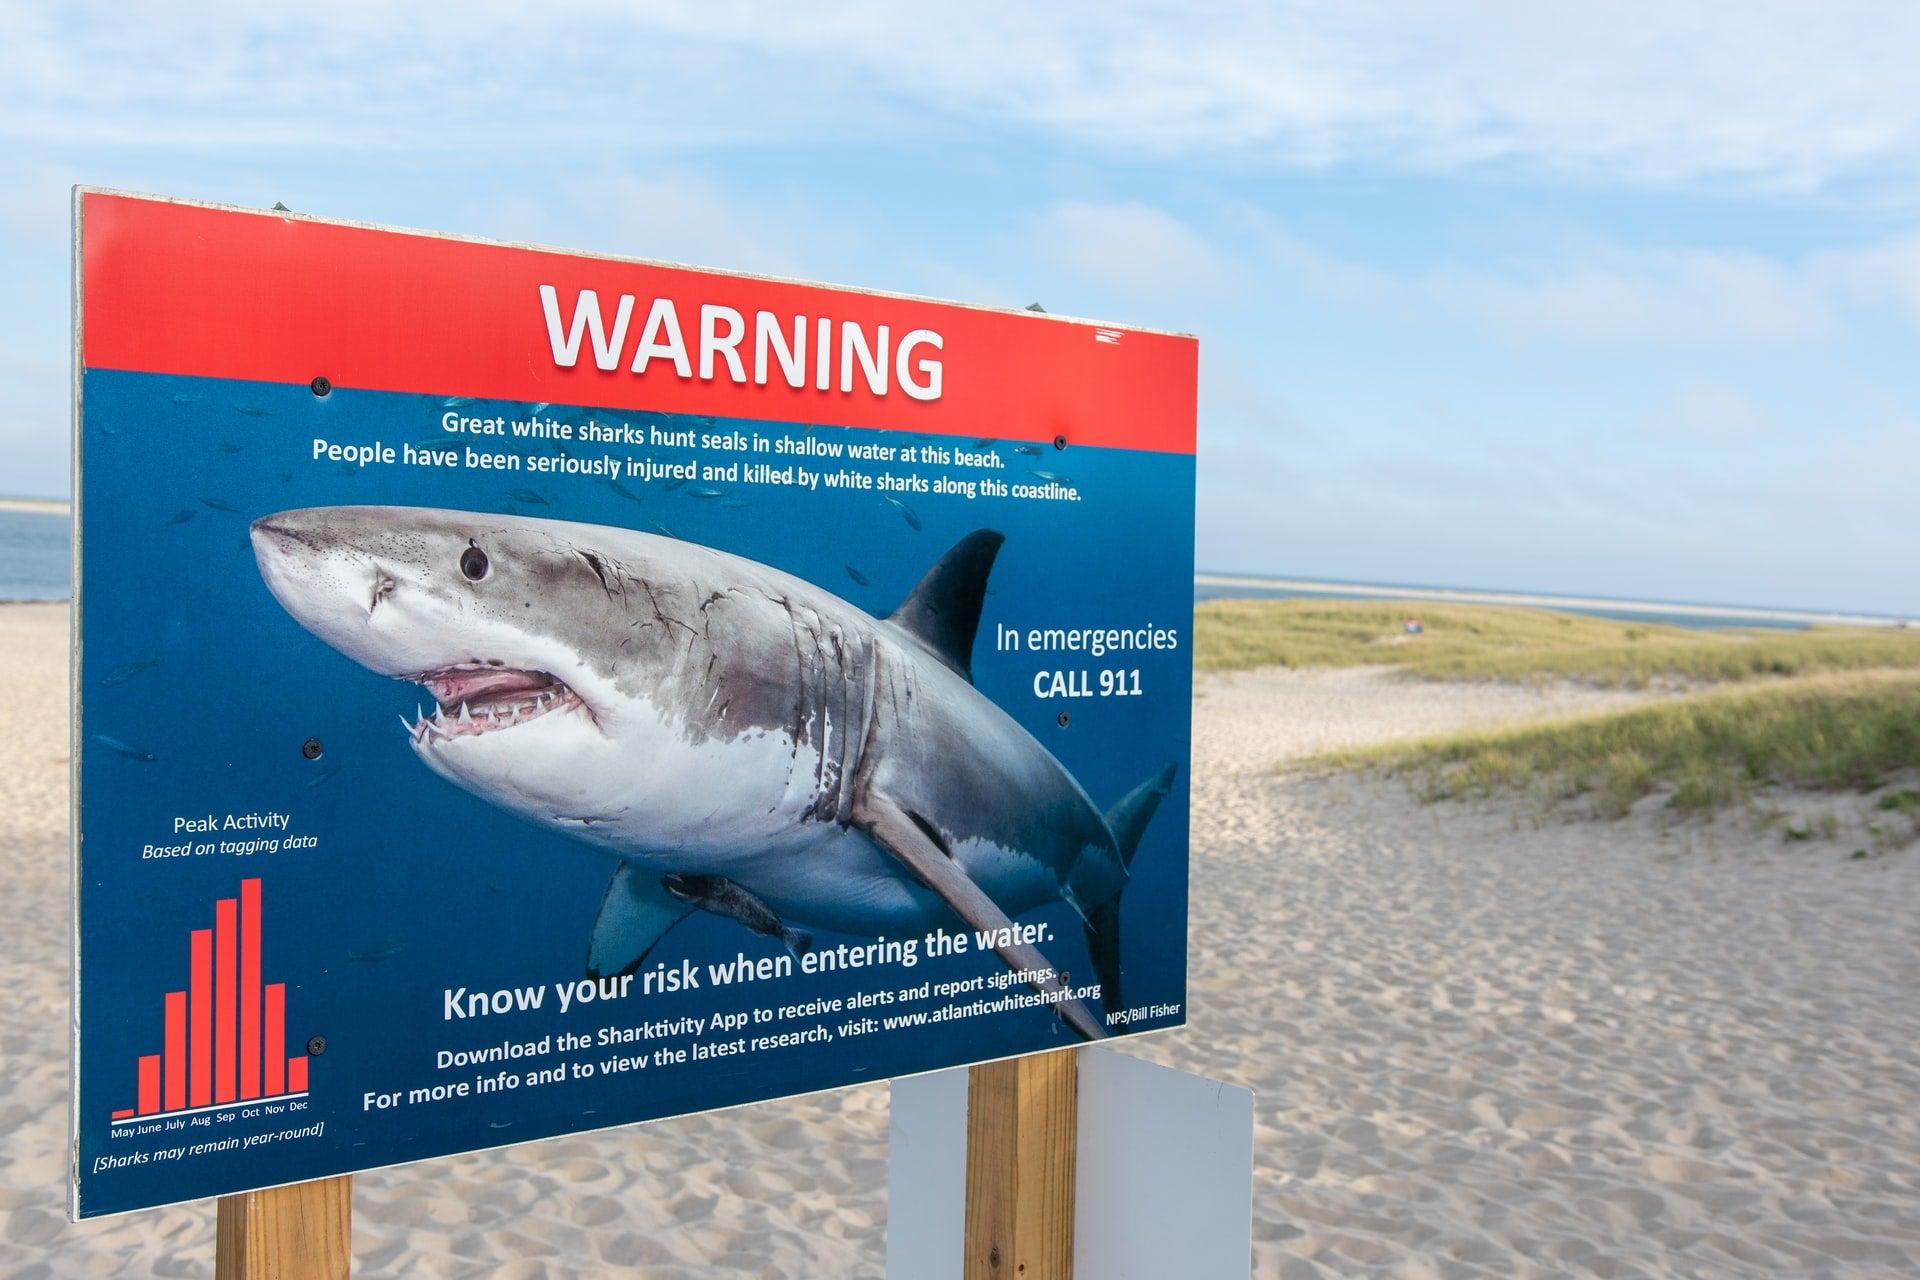 Beach sign warning of great white shark sightings in Chatham, Massachusetts